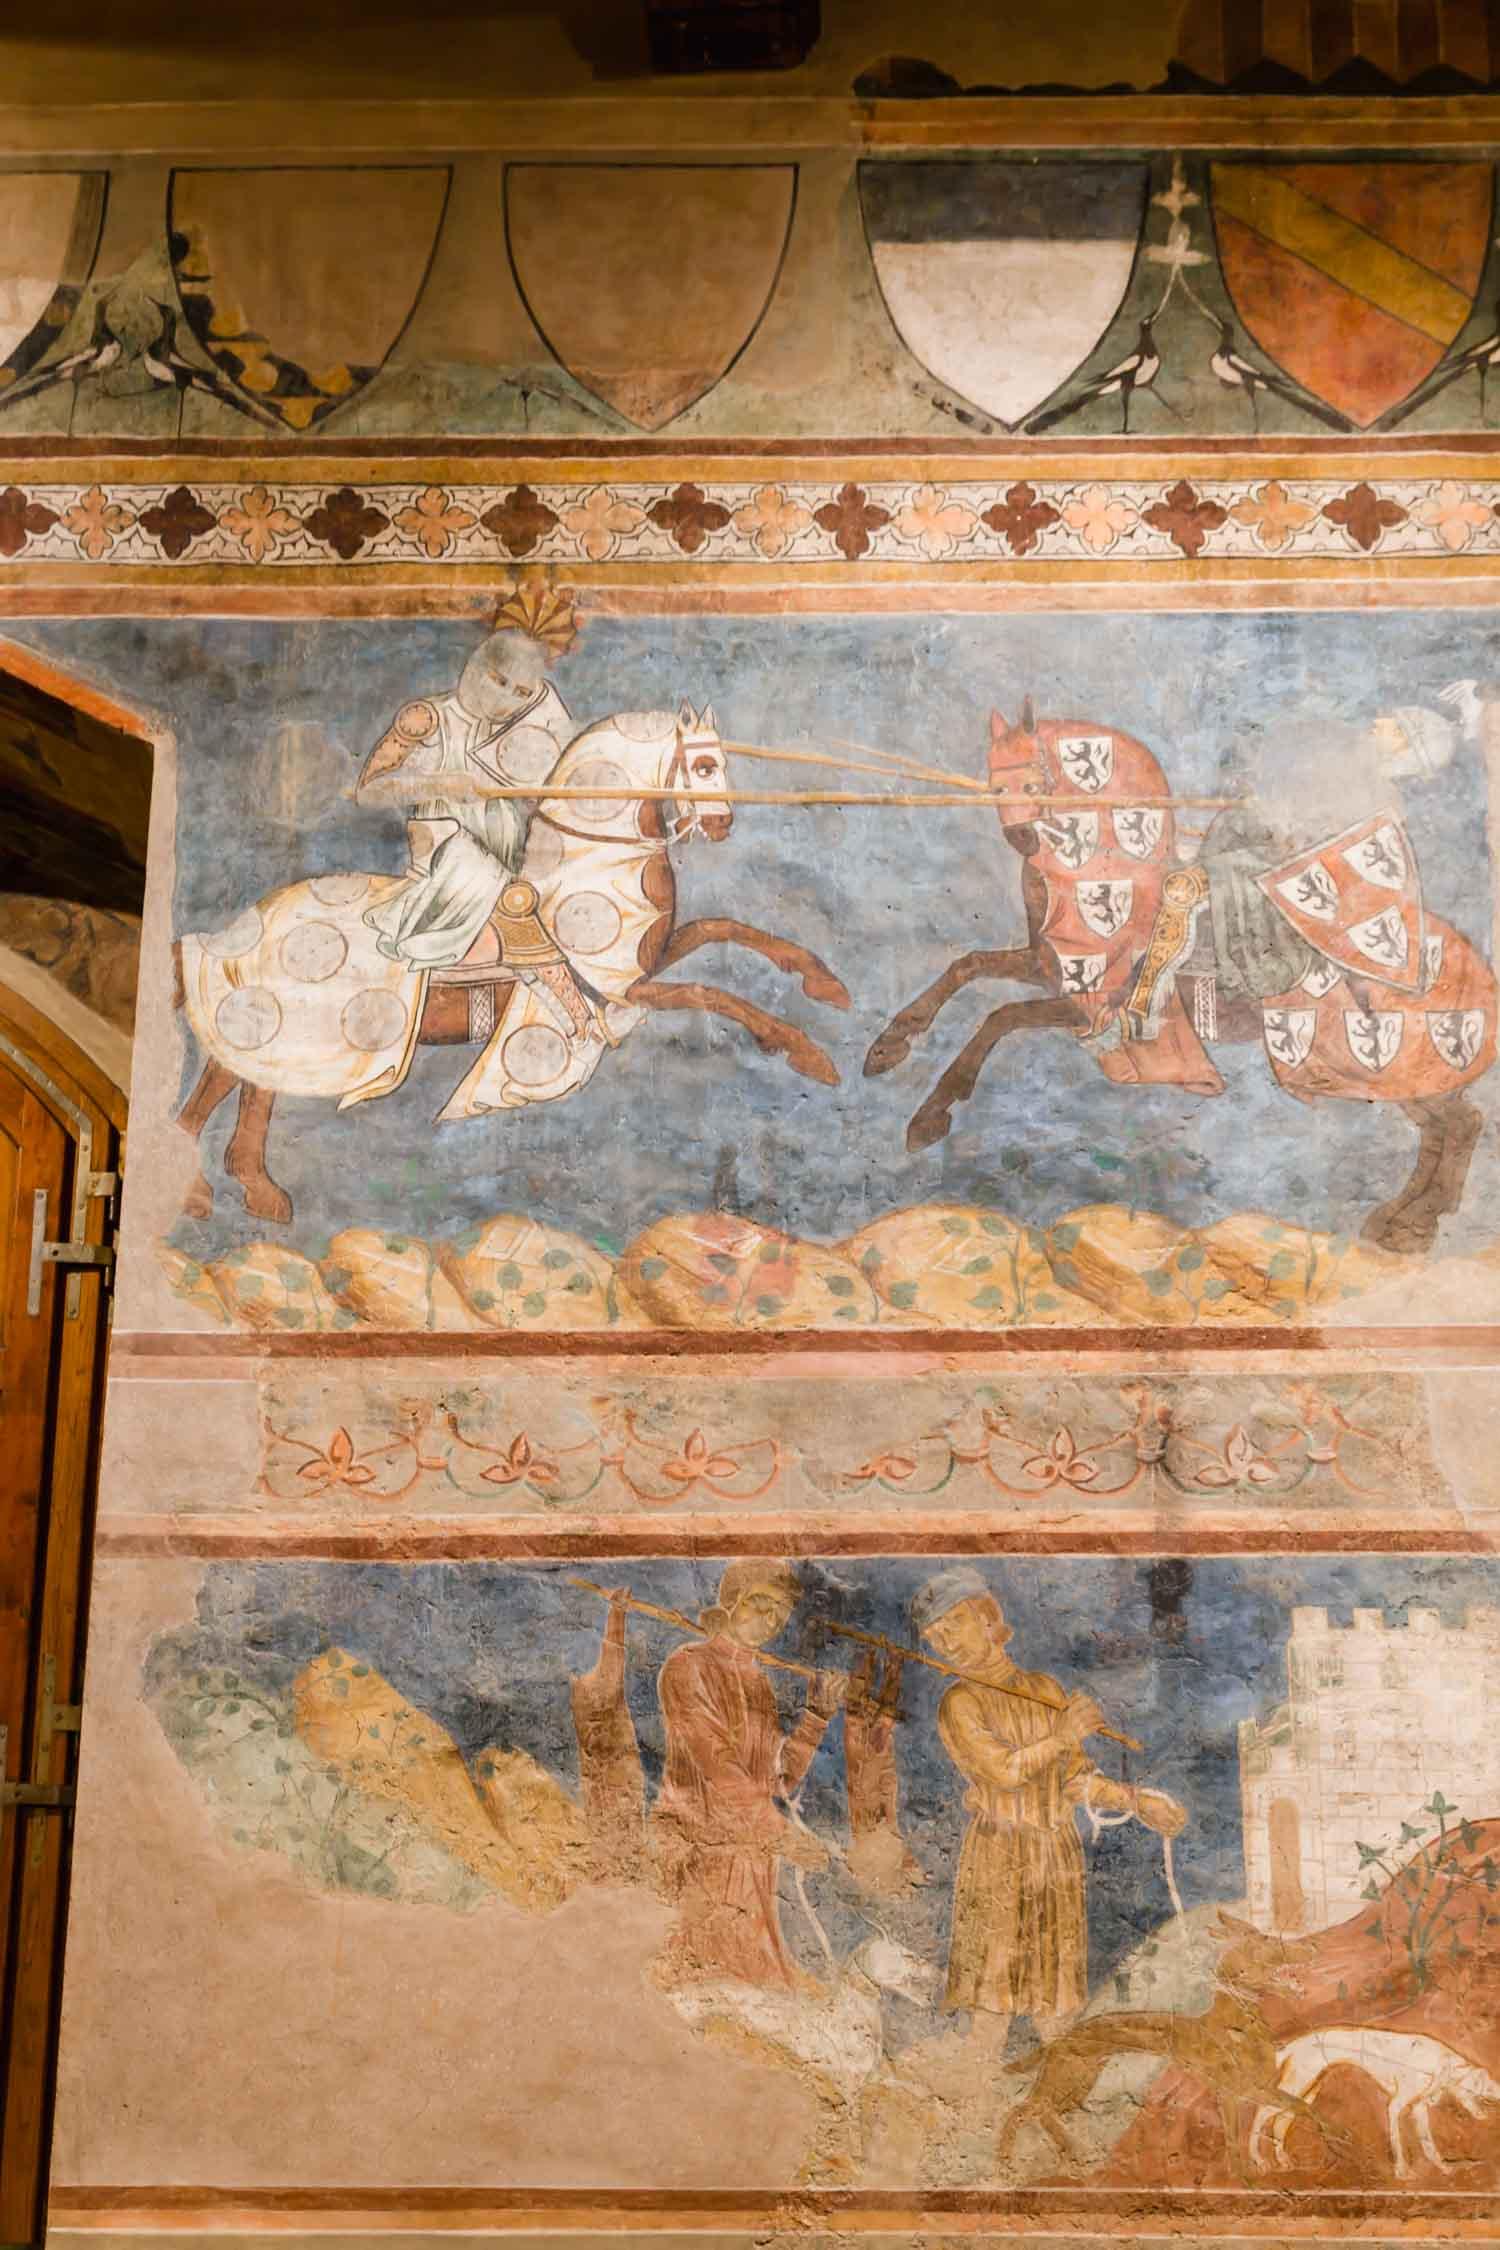 Medieval fresco in San Gimignano, Italy. #tuscany #travel #italy #italianfresco #olivegroves #italianart #vineyards #italyinautumn #veganrestaurant #vegantravel #italytravel #veganitaly #vegantuscany #veganhotel #ecotourism # #veganhotel #veganretreat #veganbedandbreakfast #sangimignano